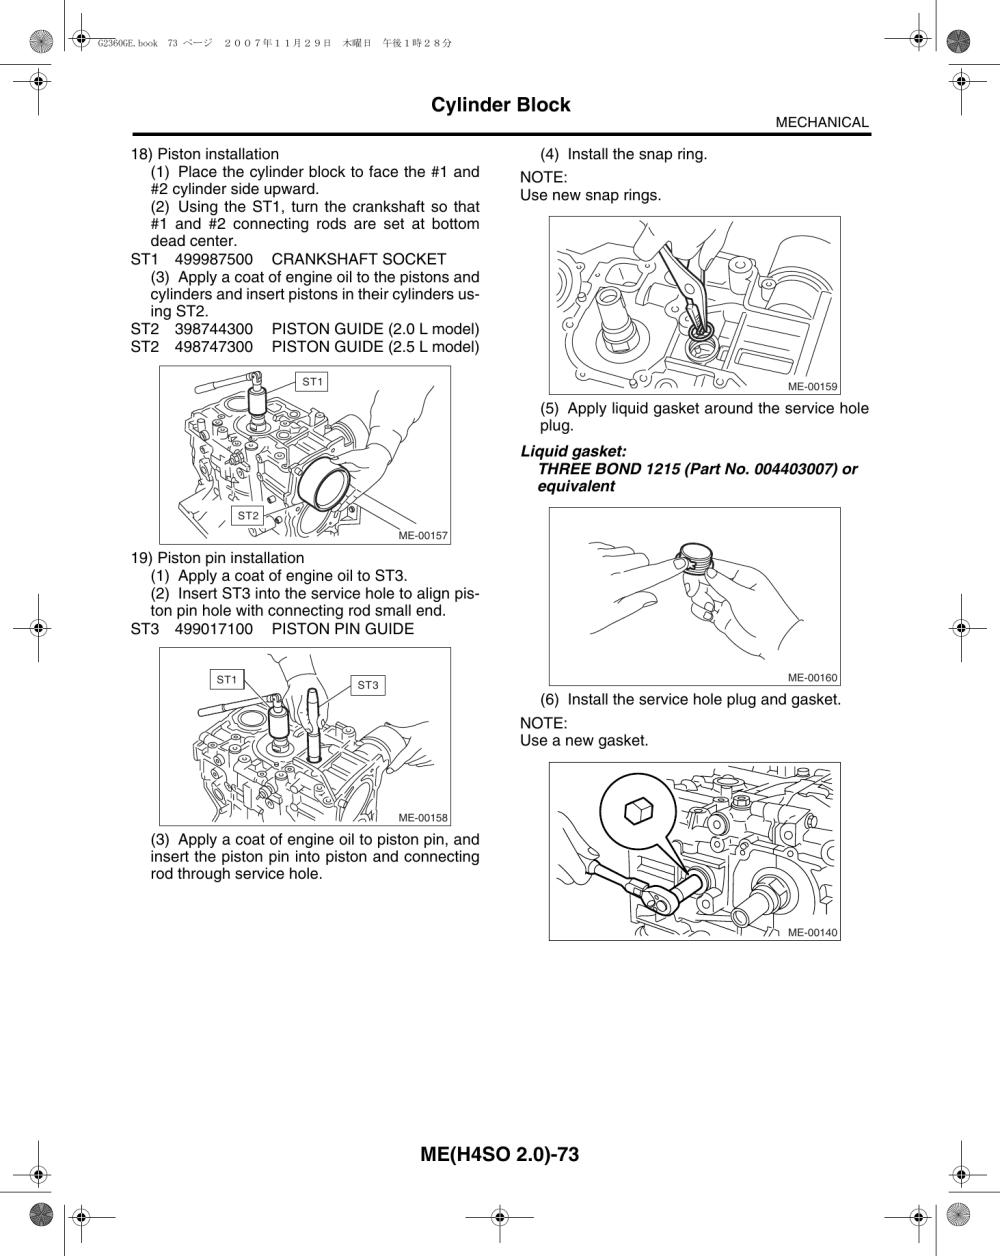 medium resolution of subaru2005subarulegacy819117 99225156 user guide page 299 png